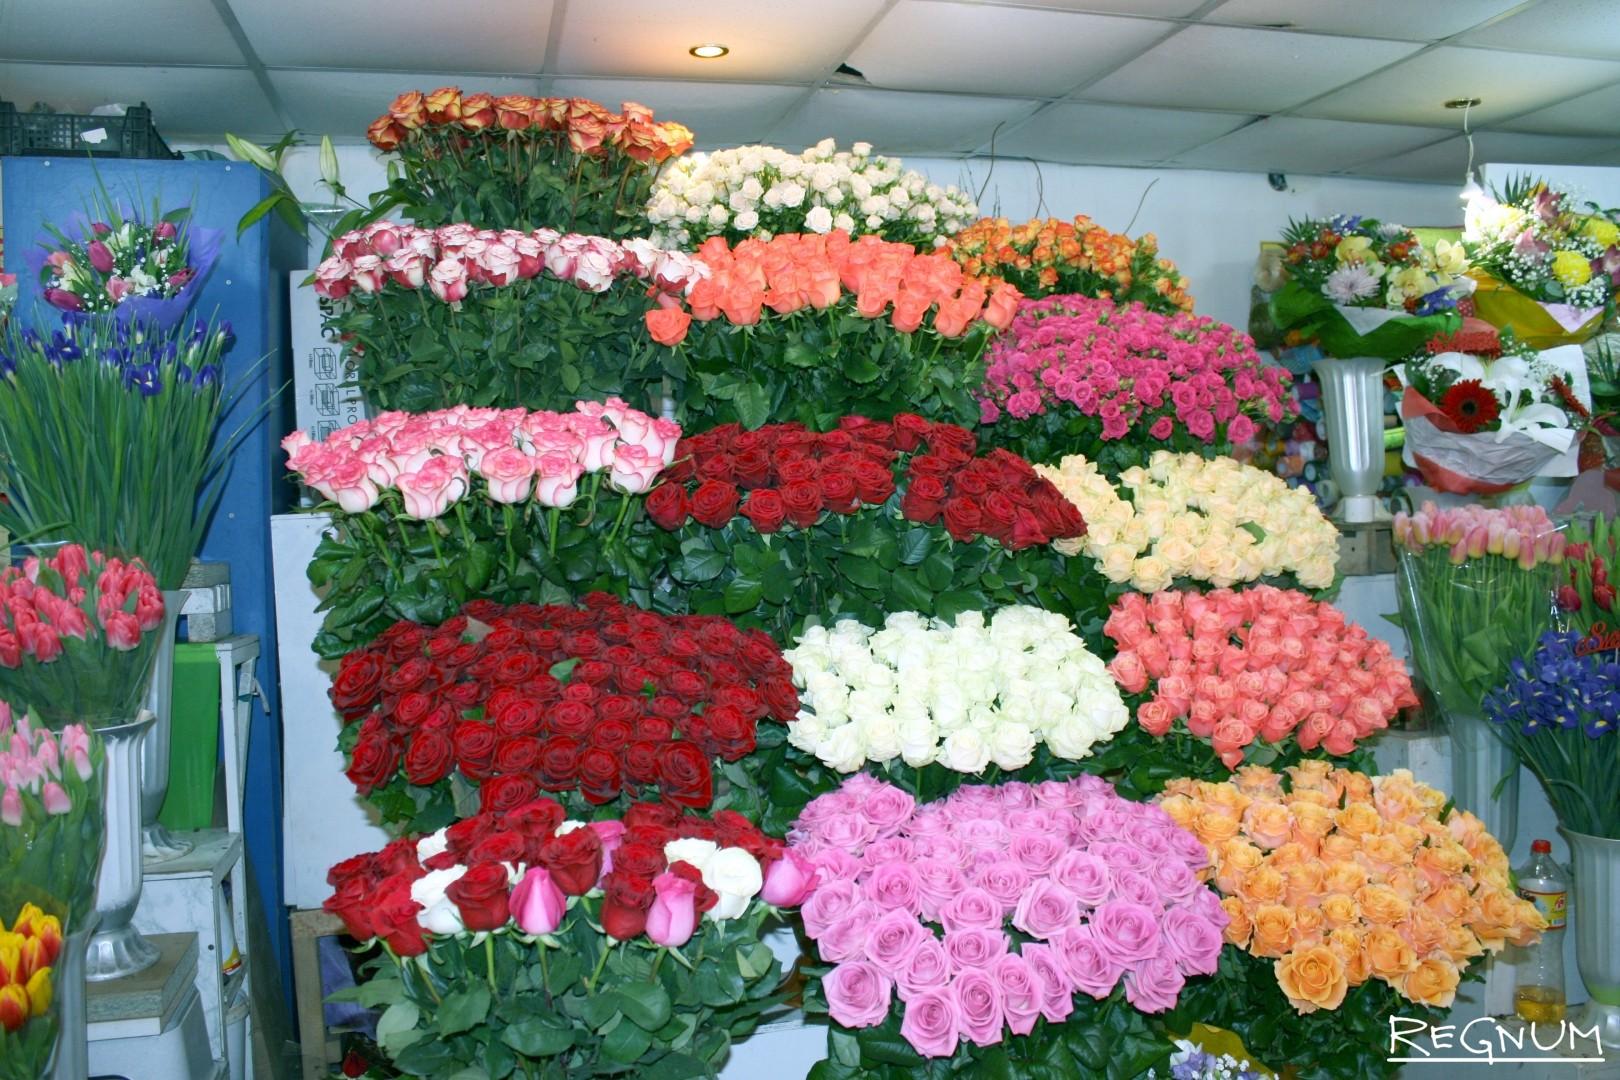 Доставка цветов со склада в москва недорого, букете цветов